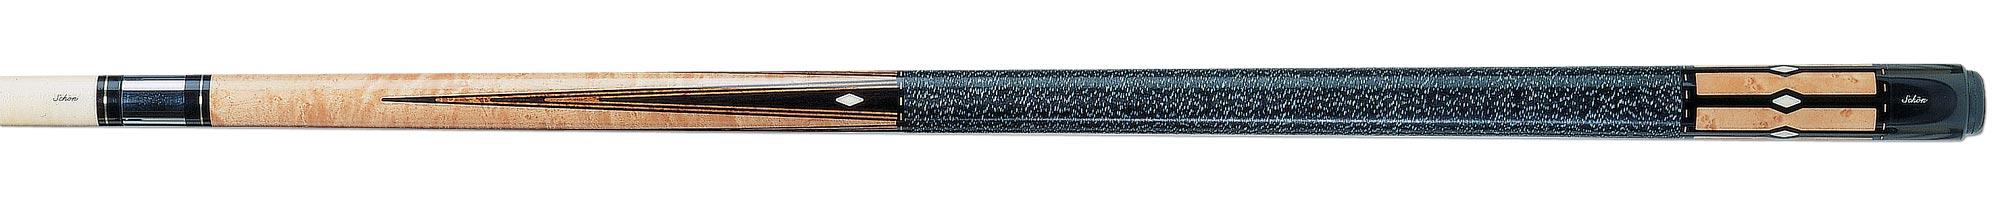 10808-Schon-STL-8-piljardikii